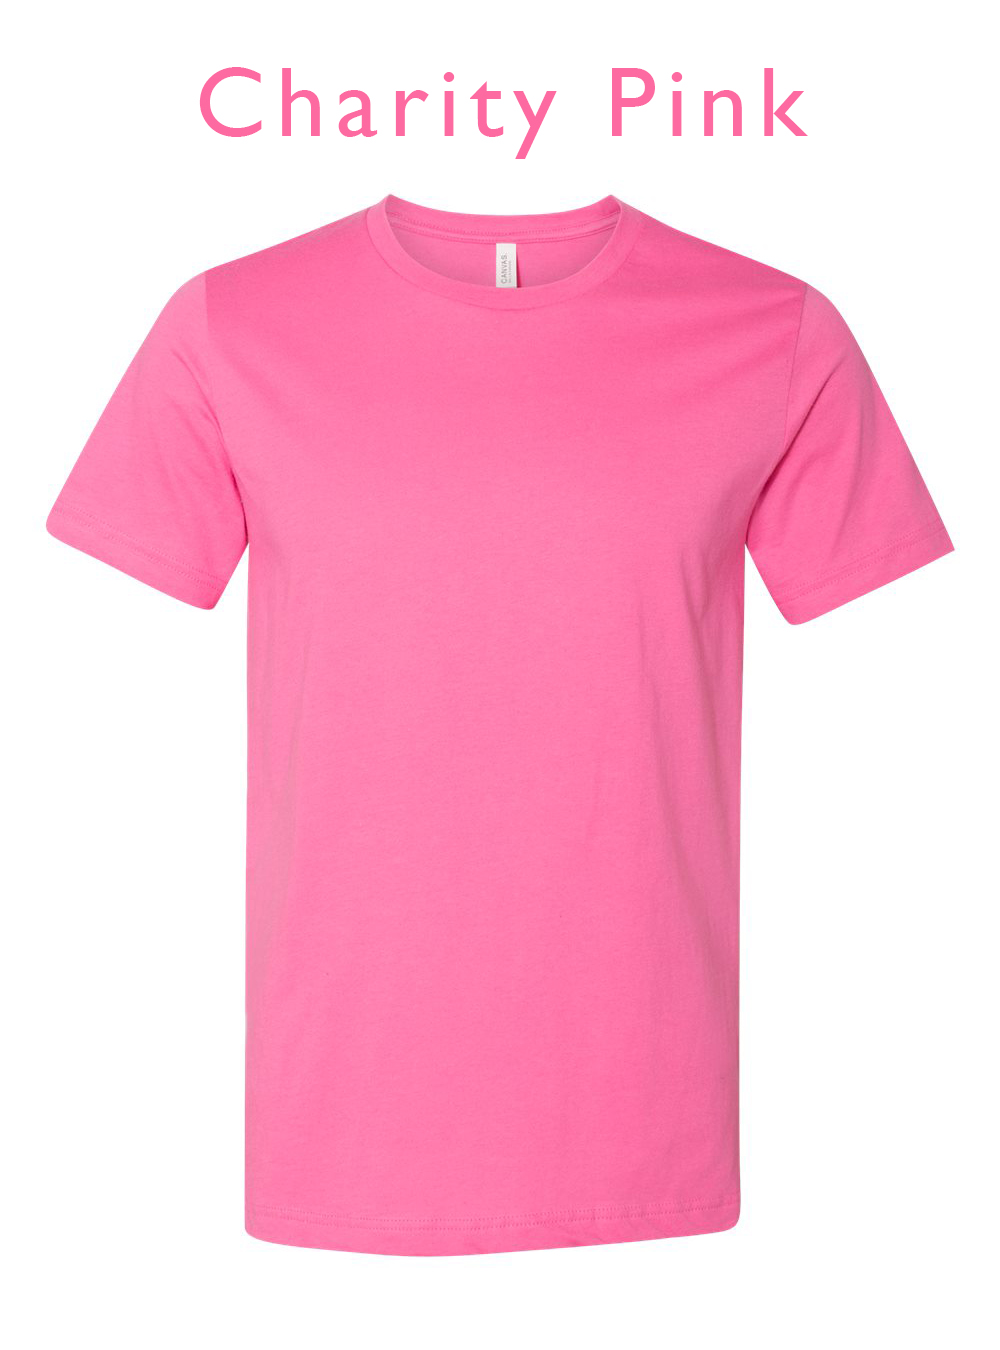 Charity Pink.jpg